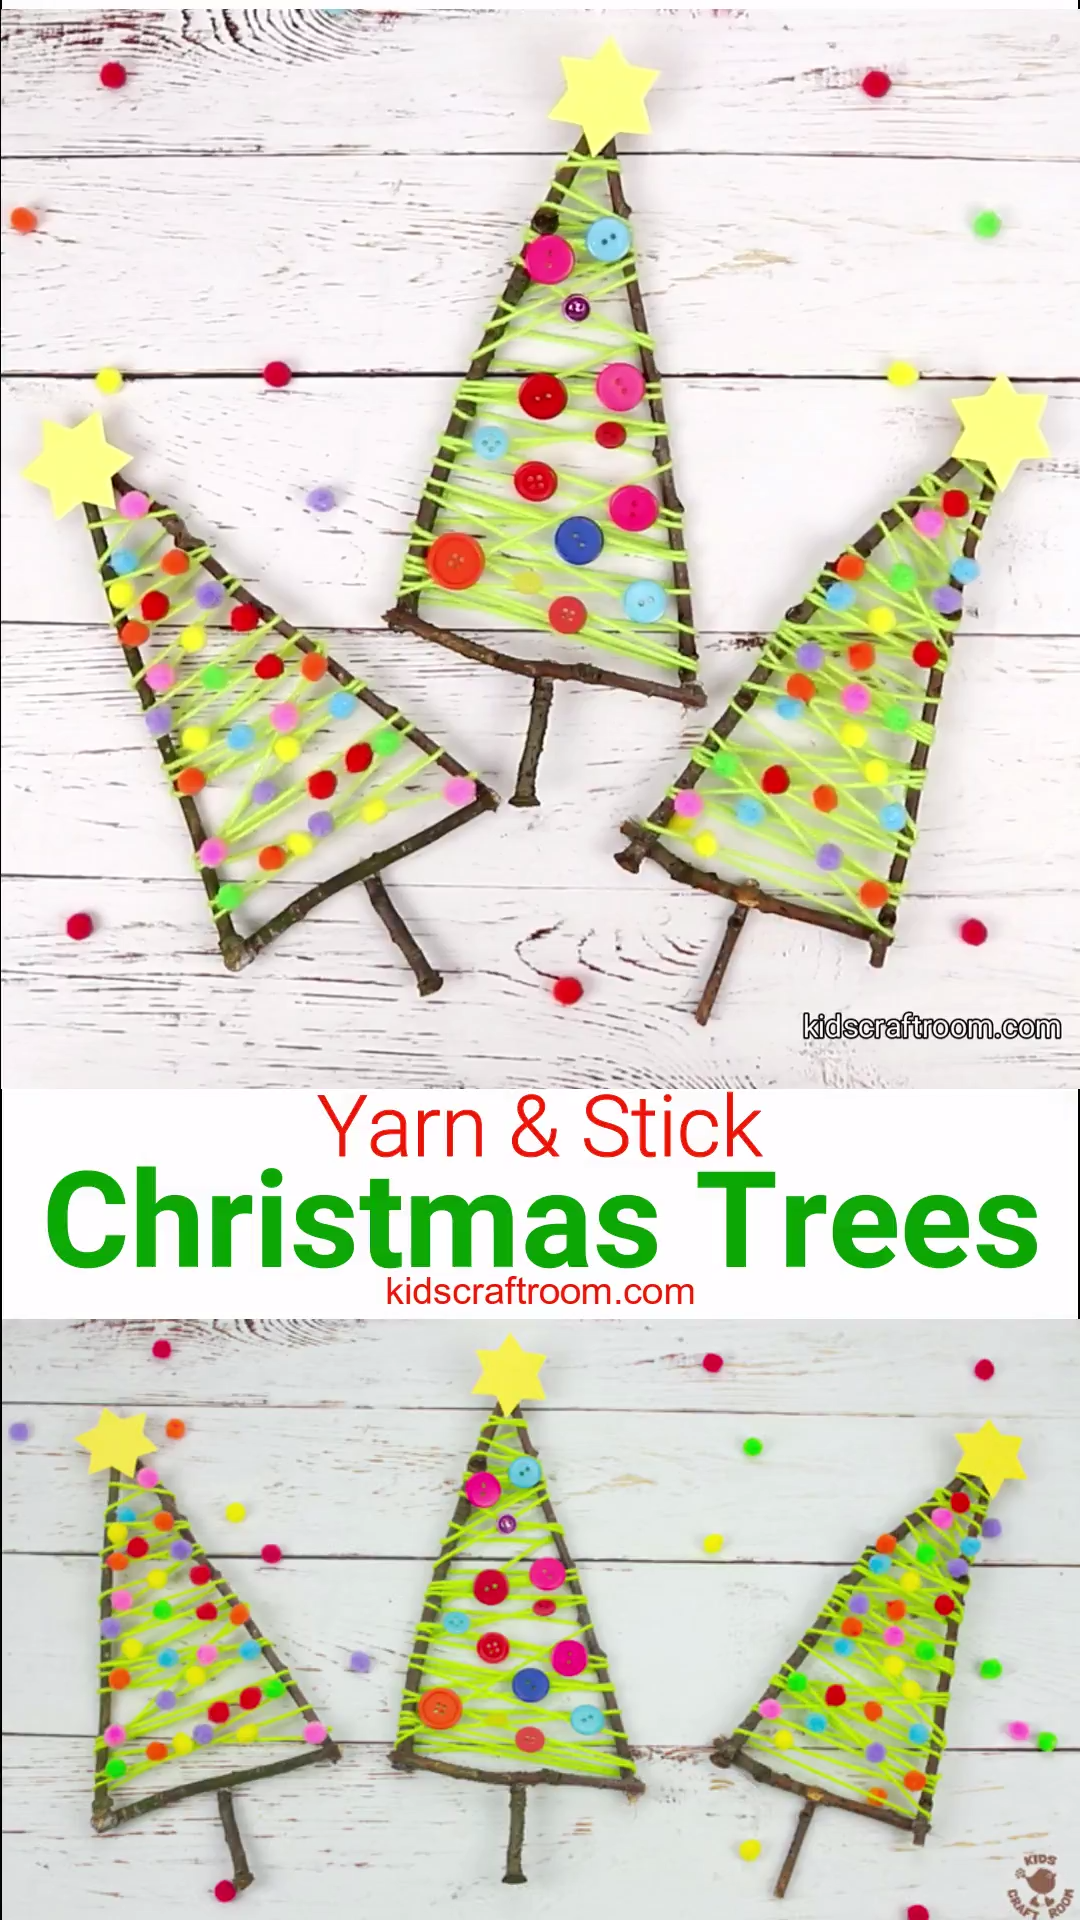 Yarn and Stick Christmas Tree Craft